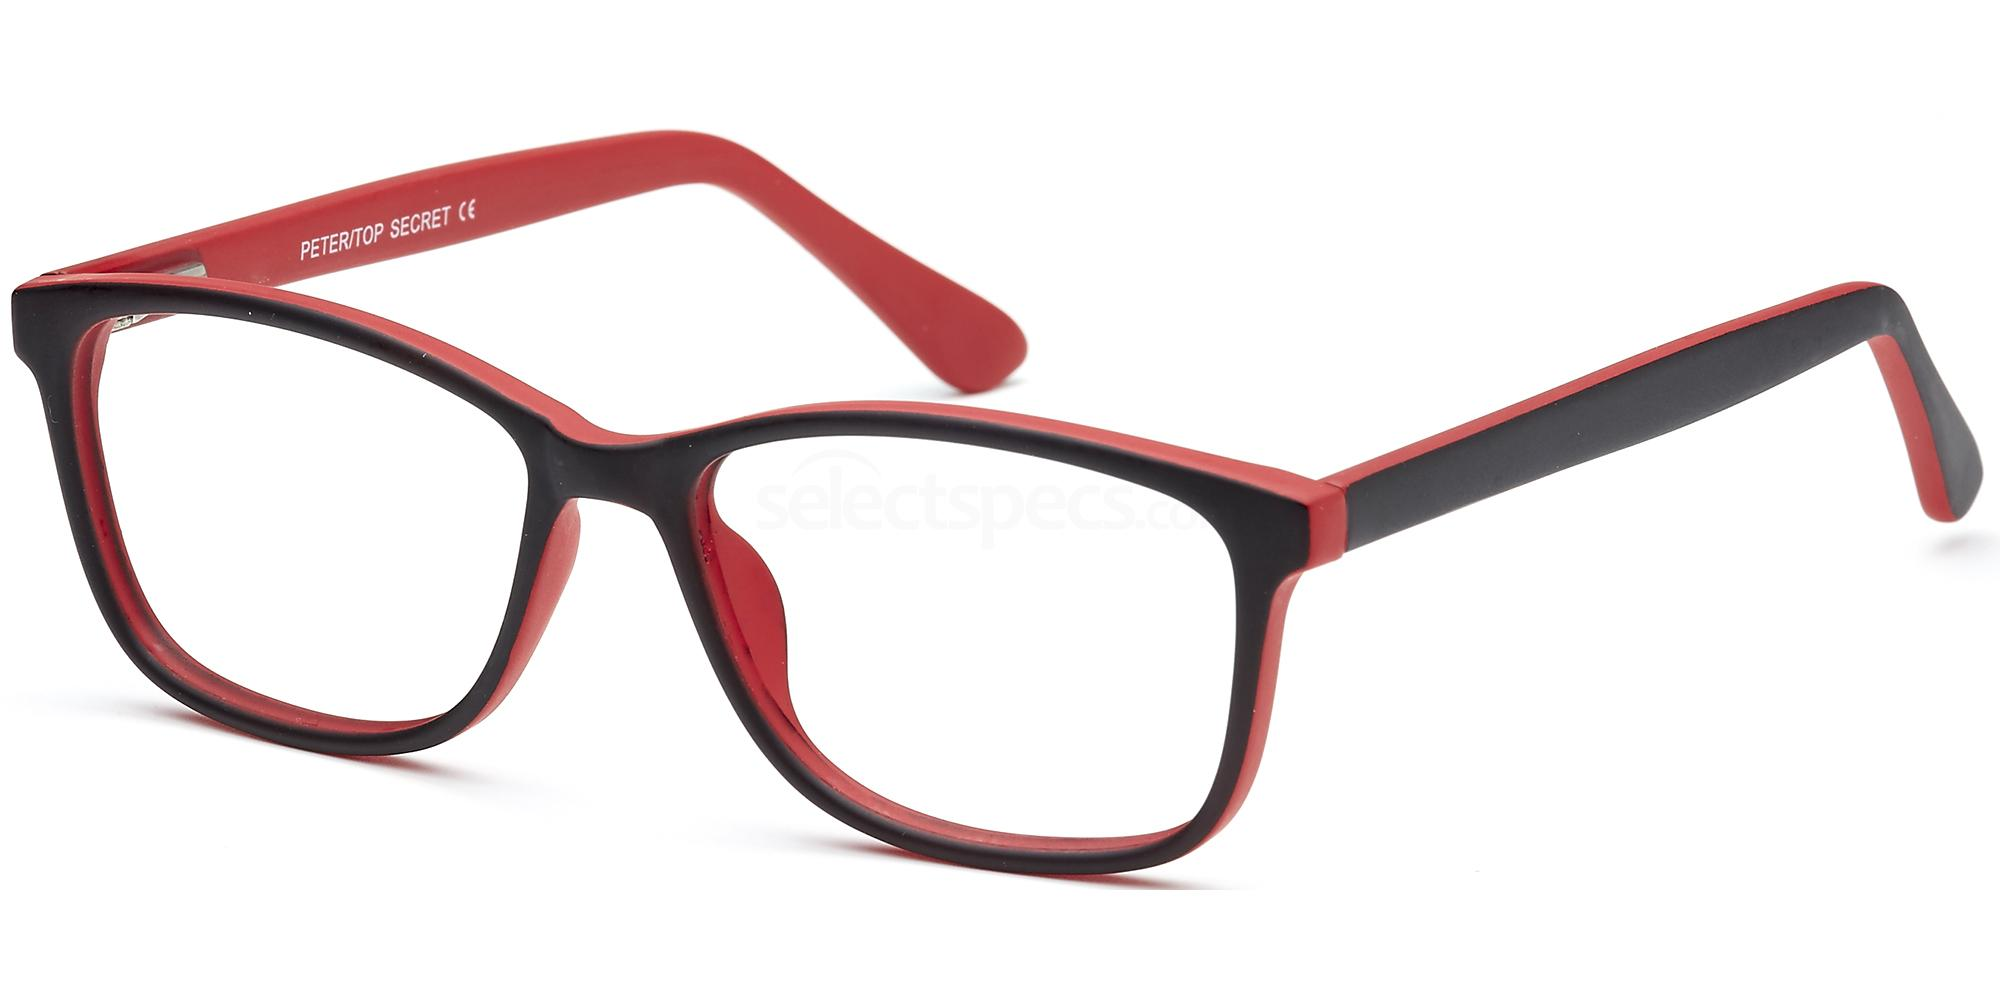 C1 PETER Glasses, Top Secret KIDS